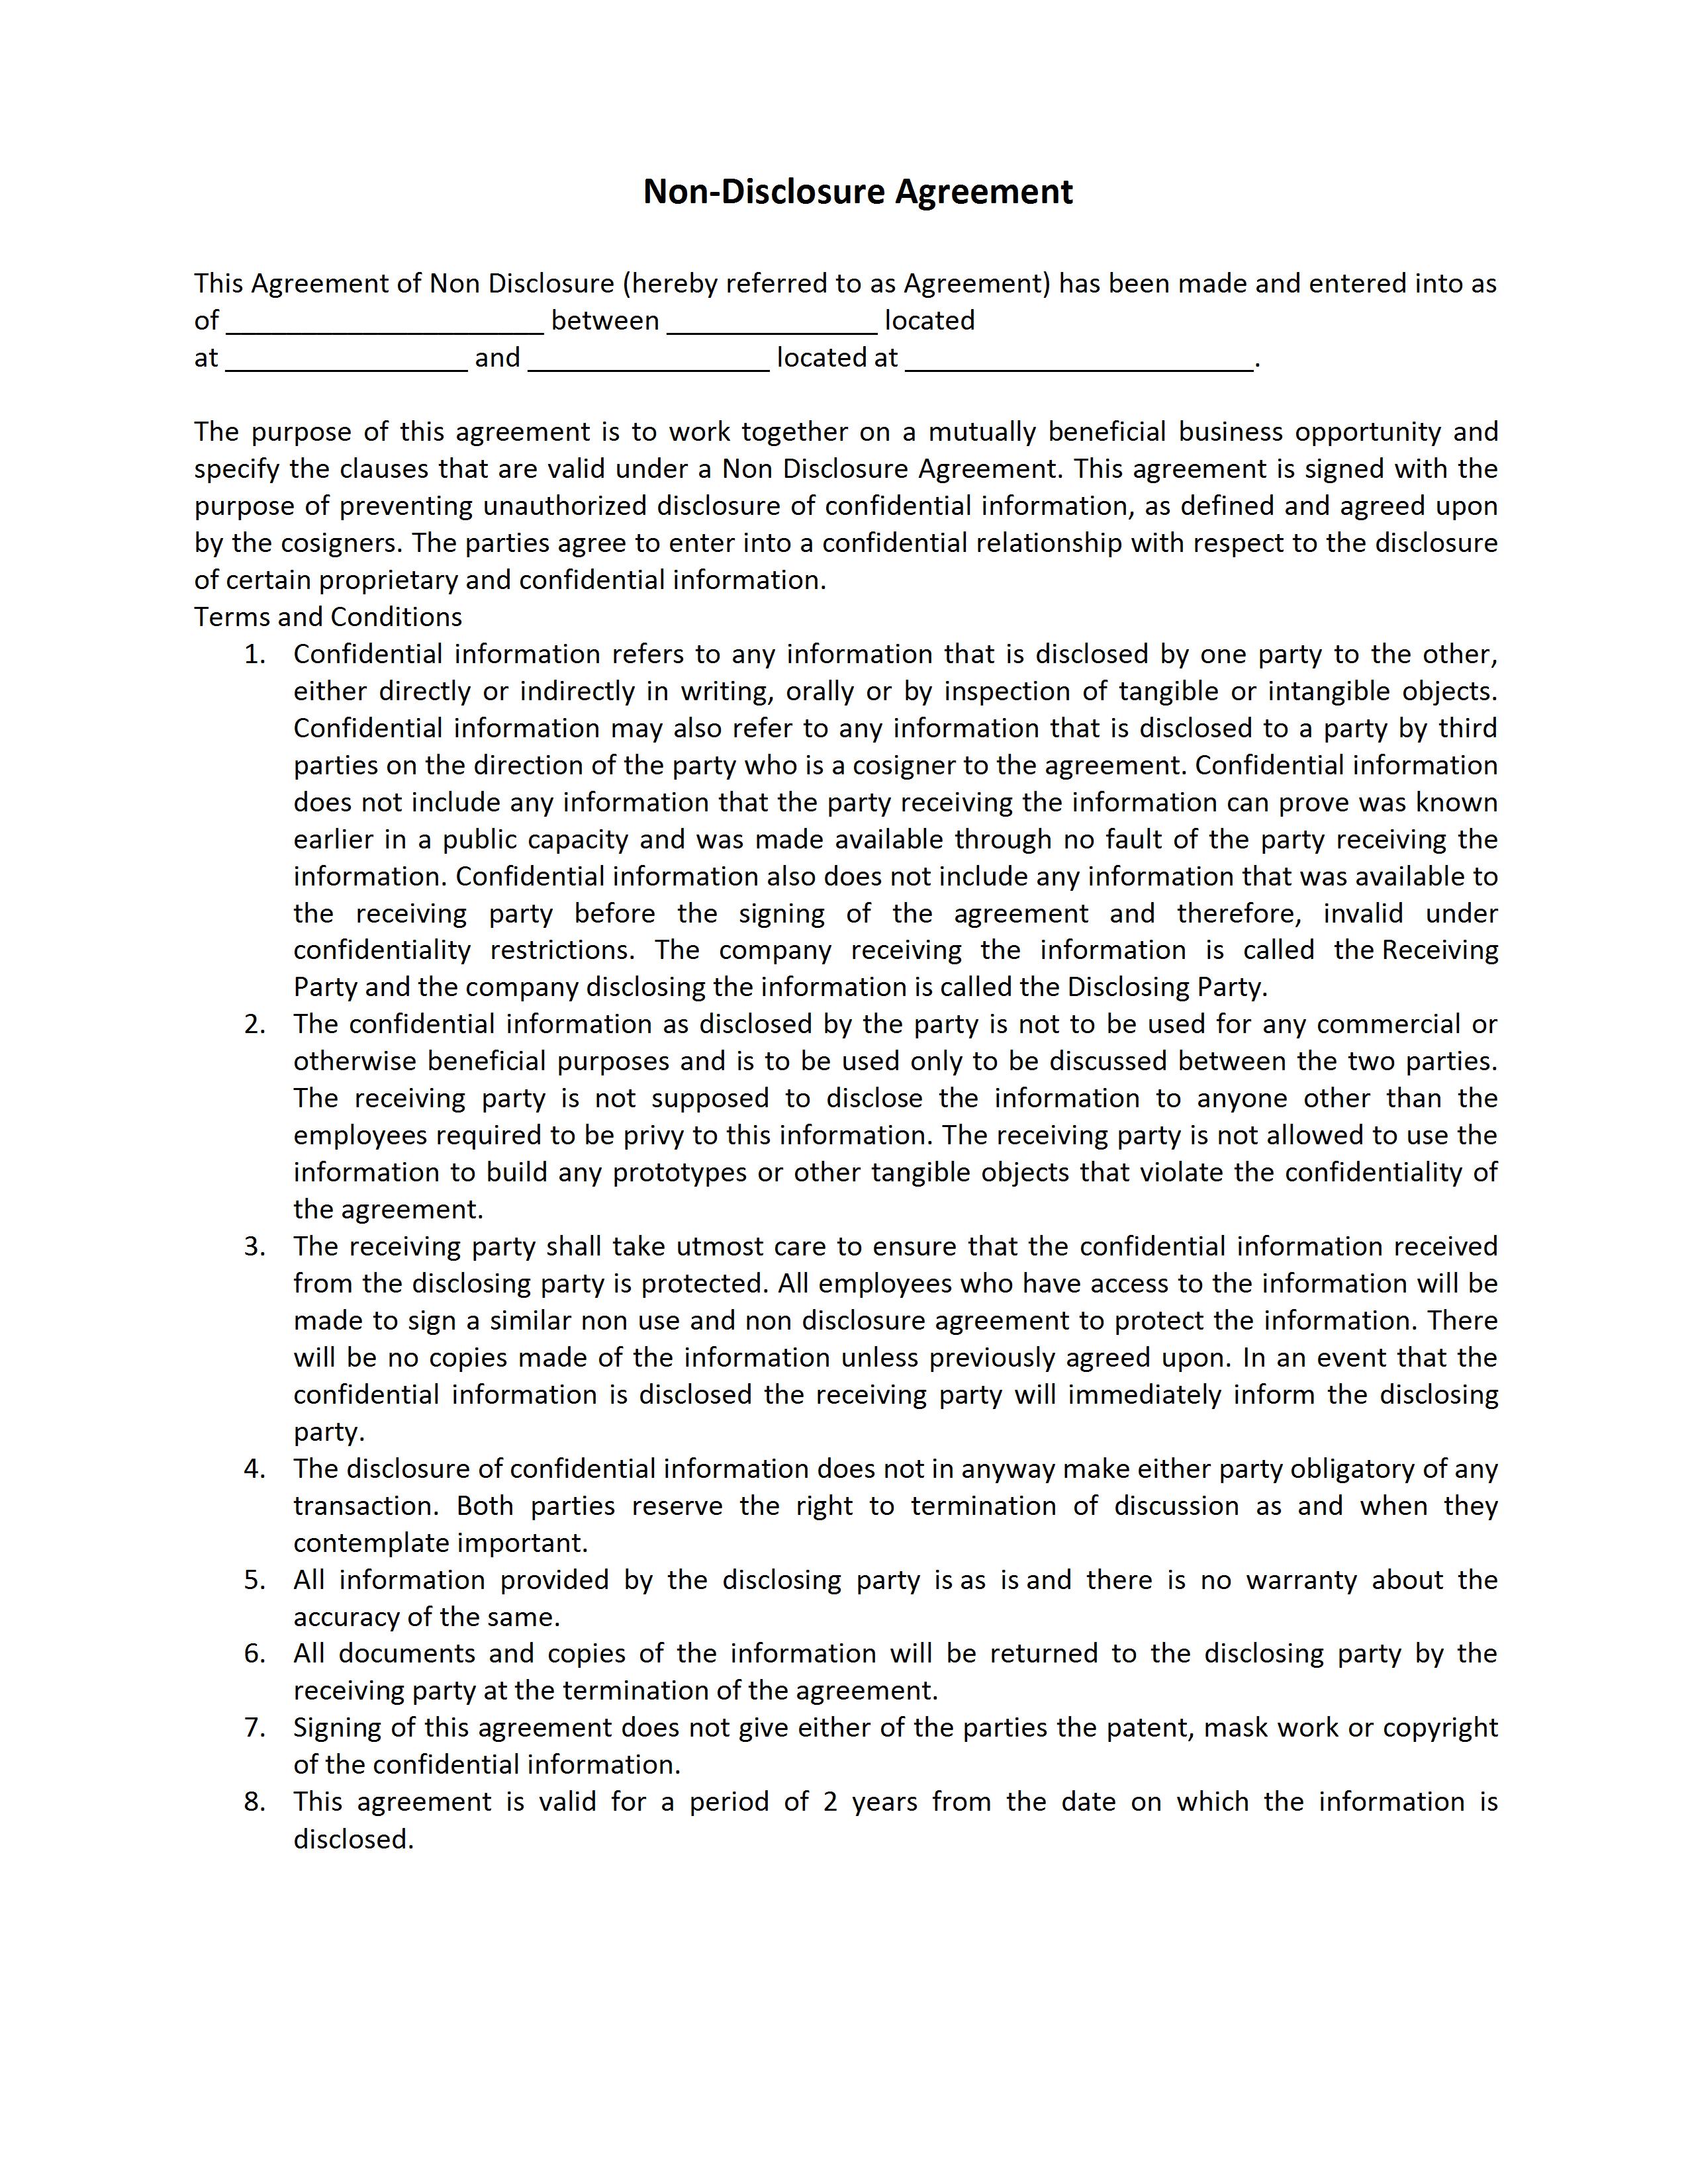 Non Disclosure Agreement Template - Bilateral nda template